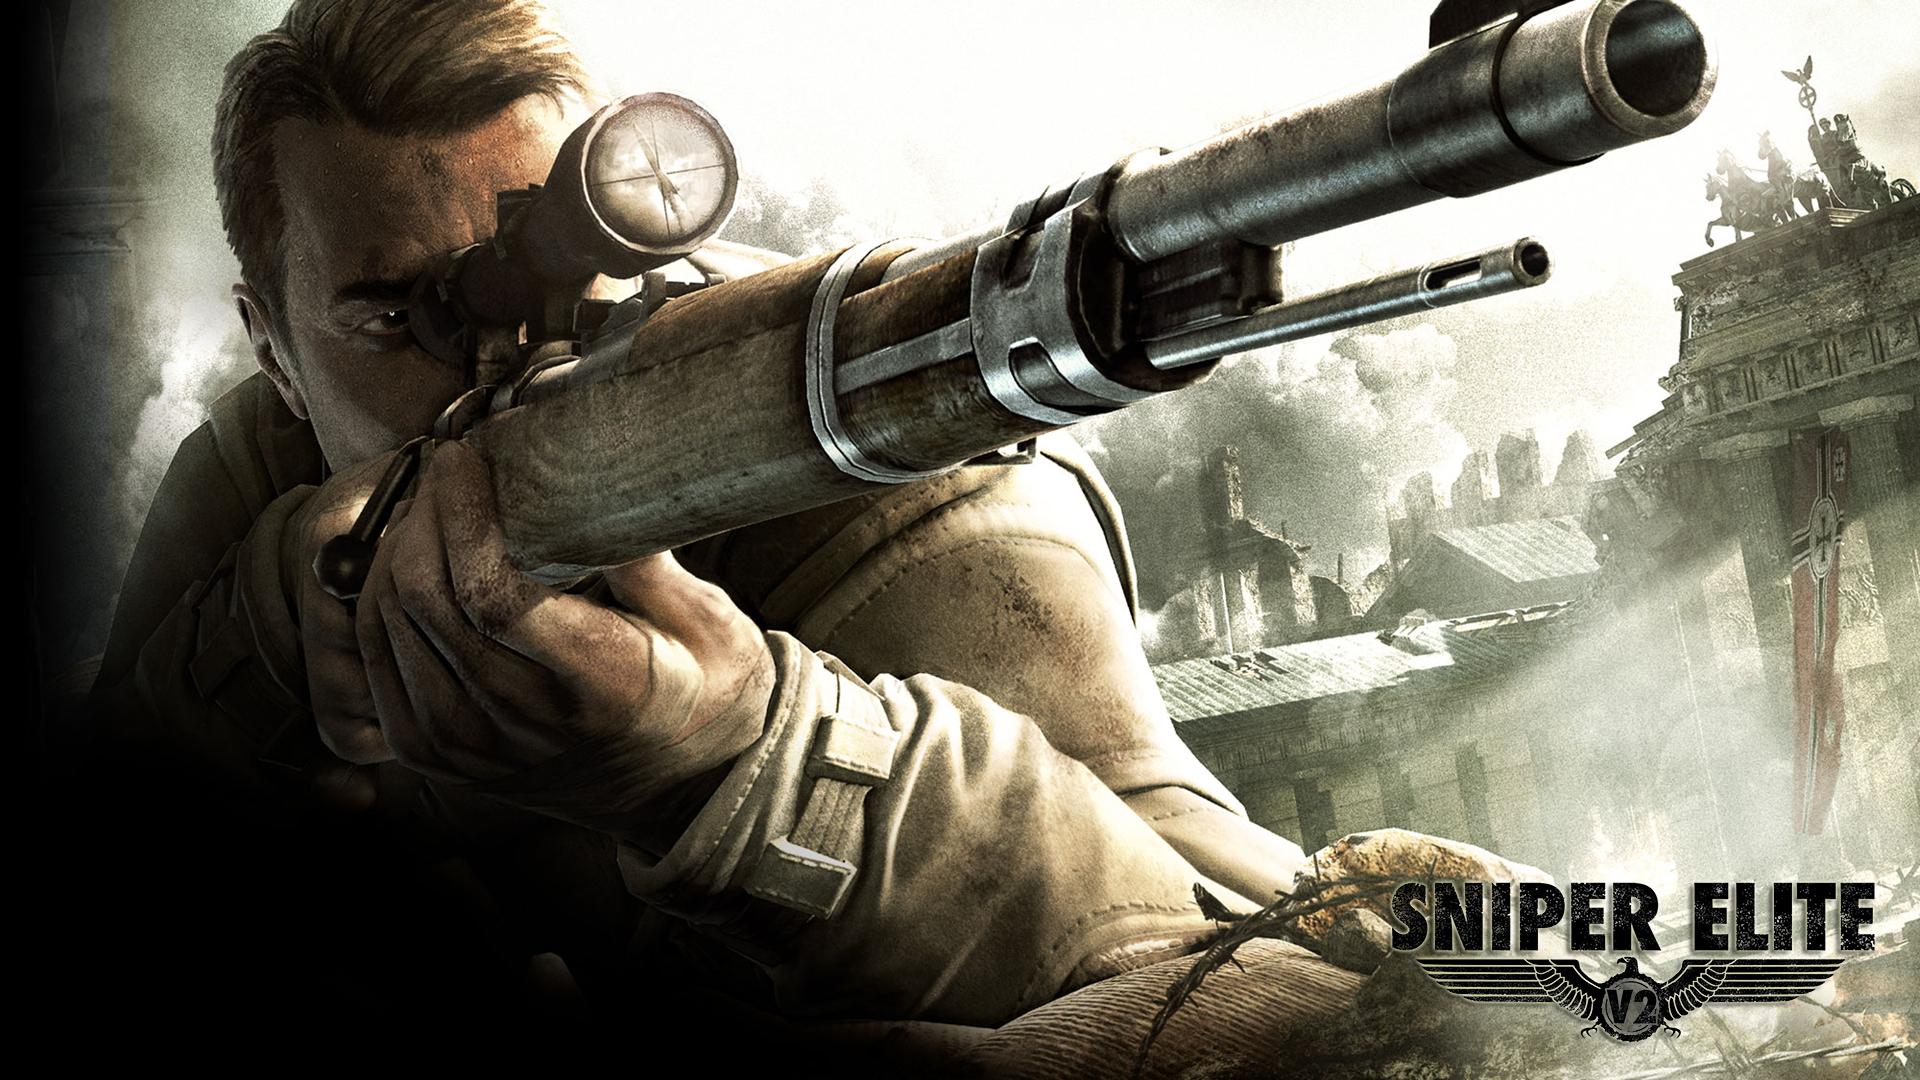 Sniper Elite 4 HD Wallpaper 11   1920 X 1080 stmednet 1920x1080